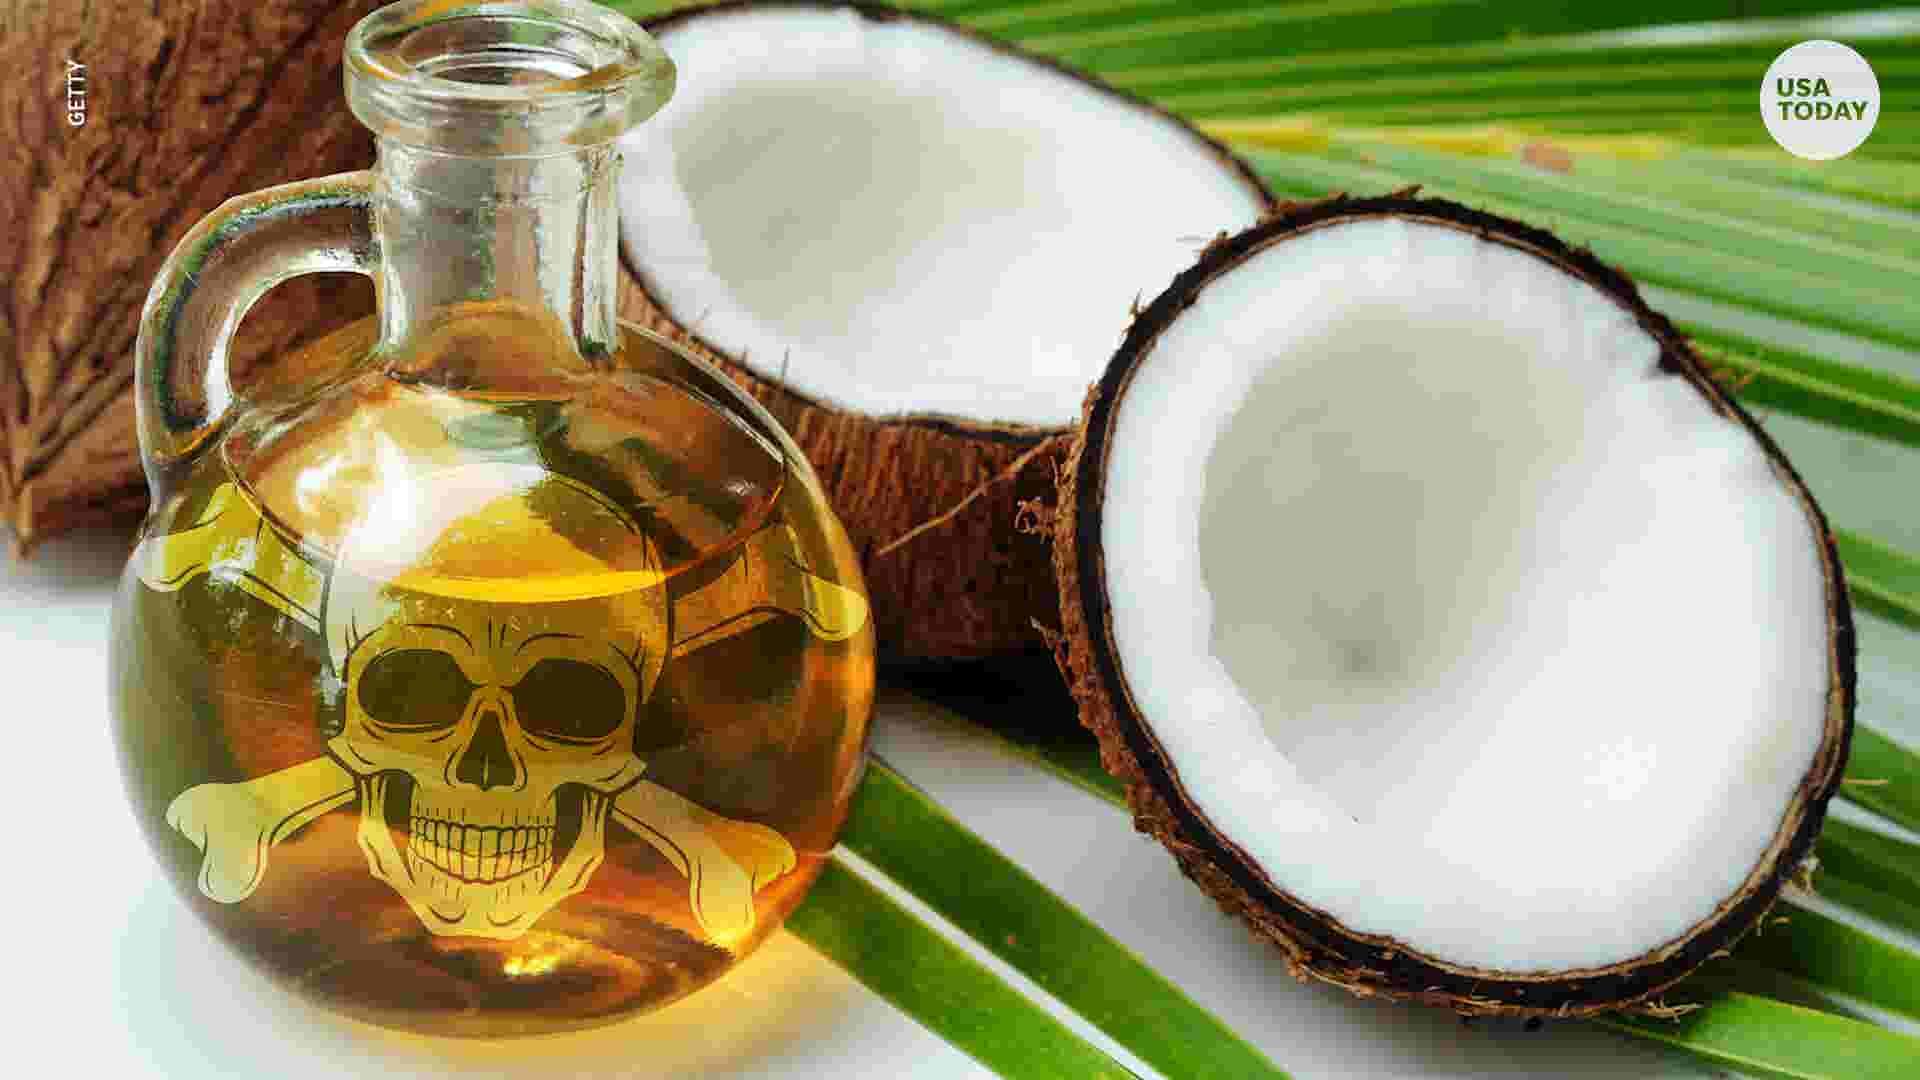 harvard professor coconut oil is pure poison